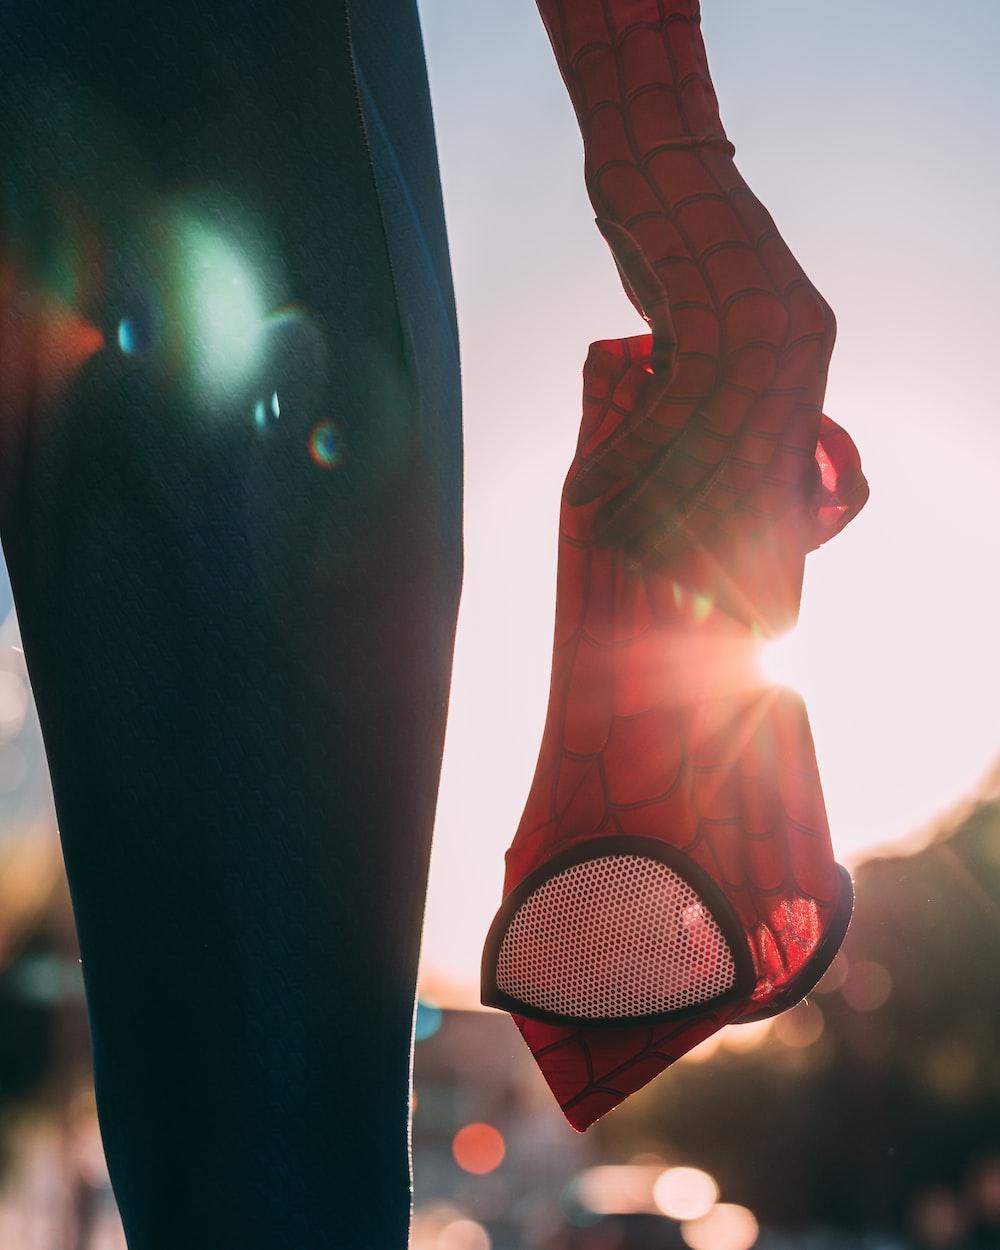 Výsledek obrázku pro superhero mask photography